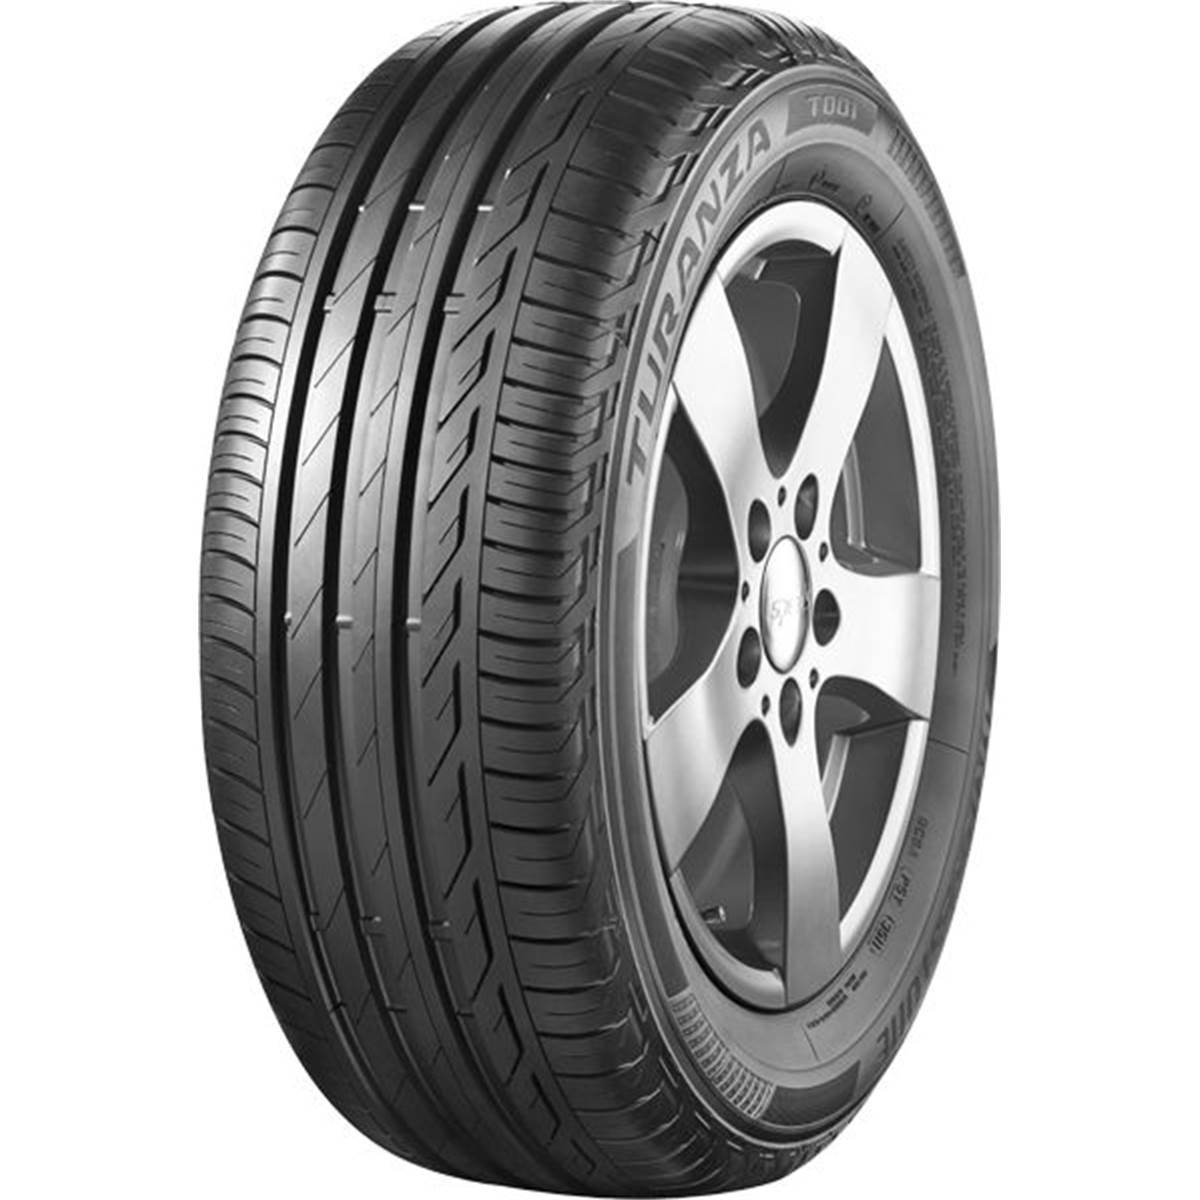 Pneu Bridgestone 205/60R16 92H Turanza T001